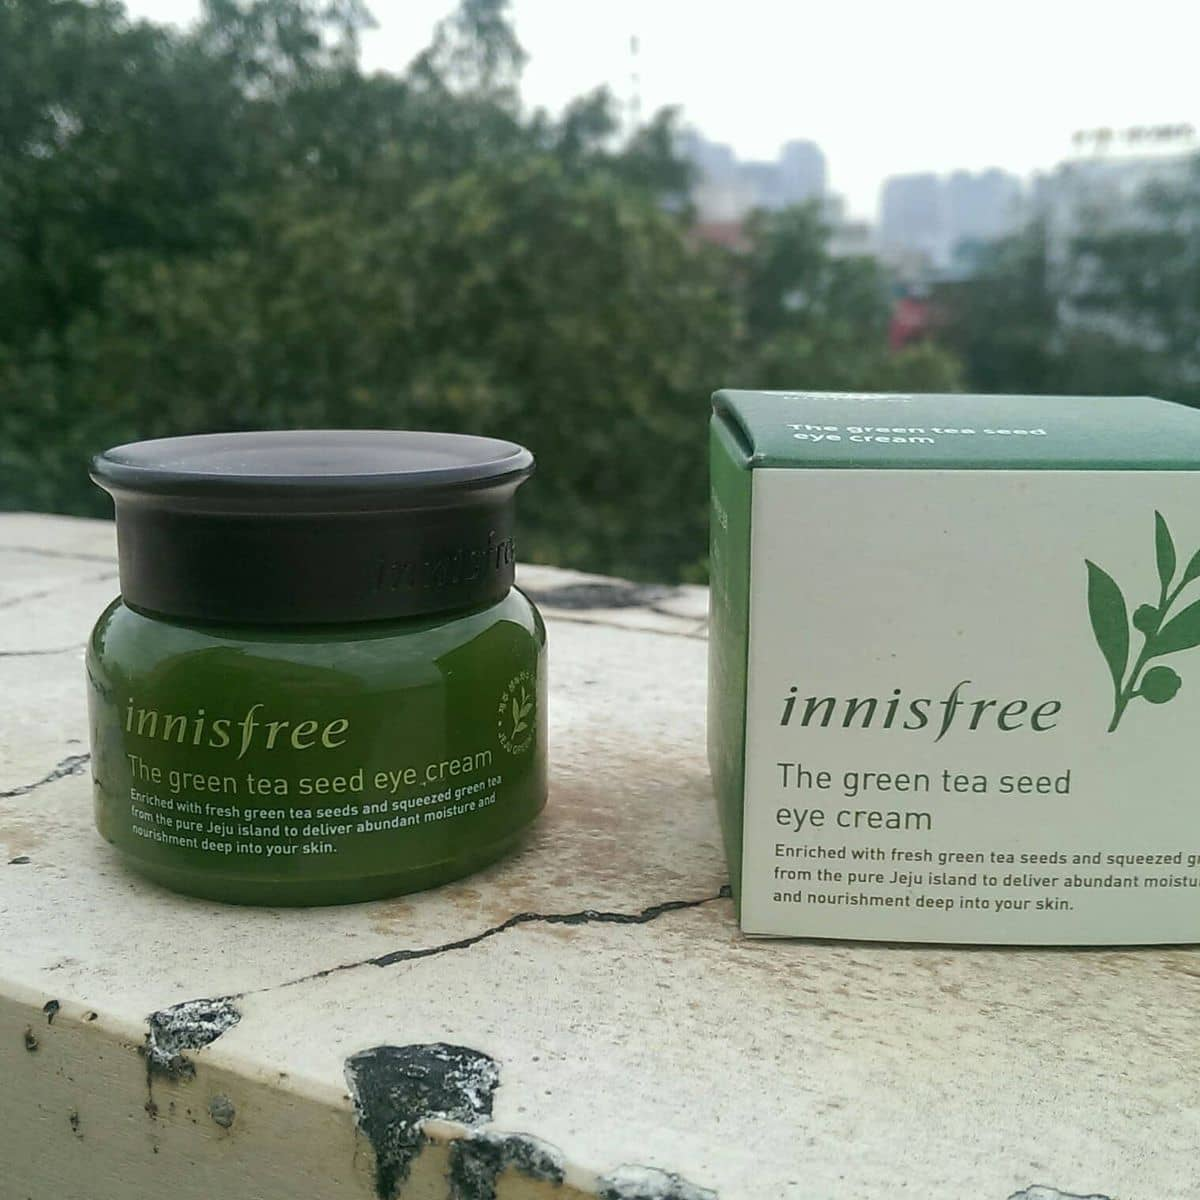 Kem Dng Mt Innisfree Green Tea Seed Eye Cream Ti Habigarden Ca Lozi